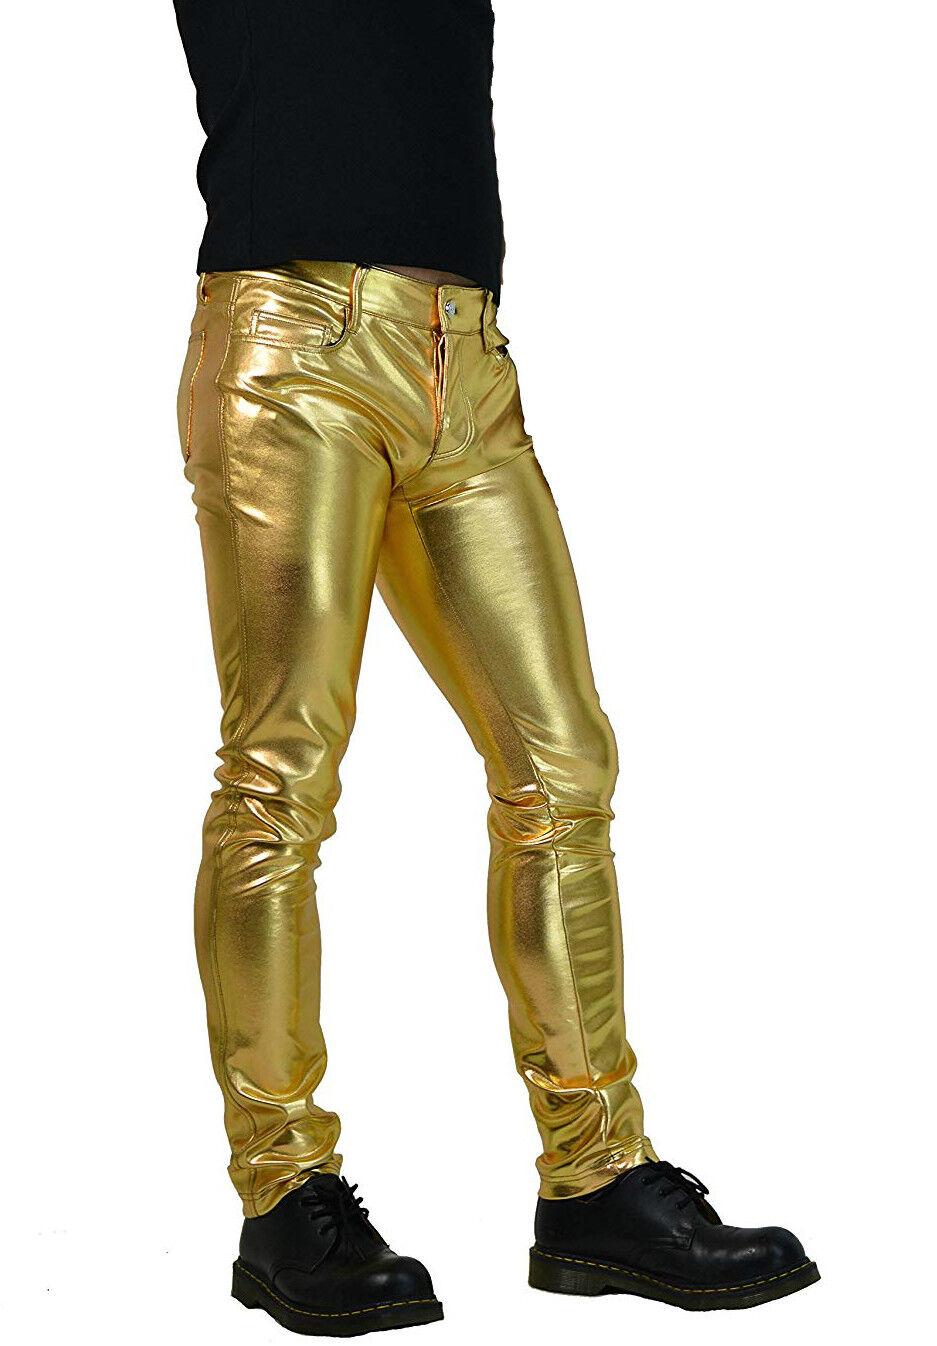 HORSE HORN GOLD TIGHT FIT BURNER FETISH PVC VINYL ROCKER RAVE SKINNY JEANS PANTS Clothing, Shoes & Accessories